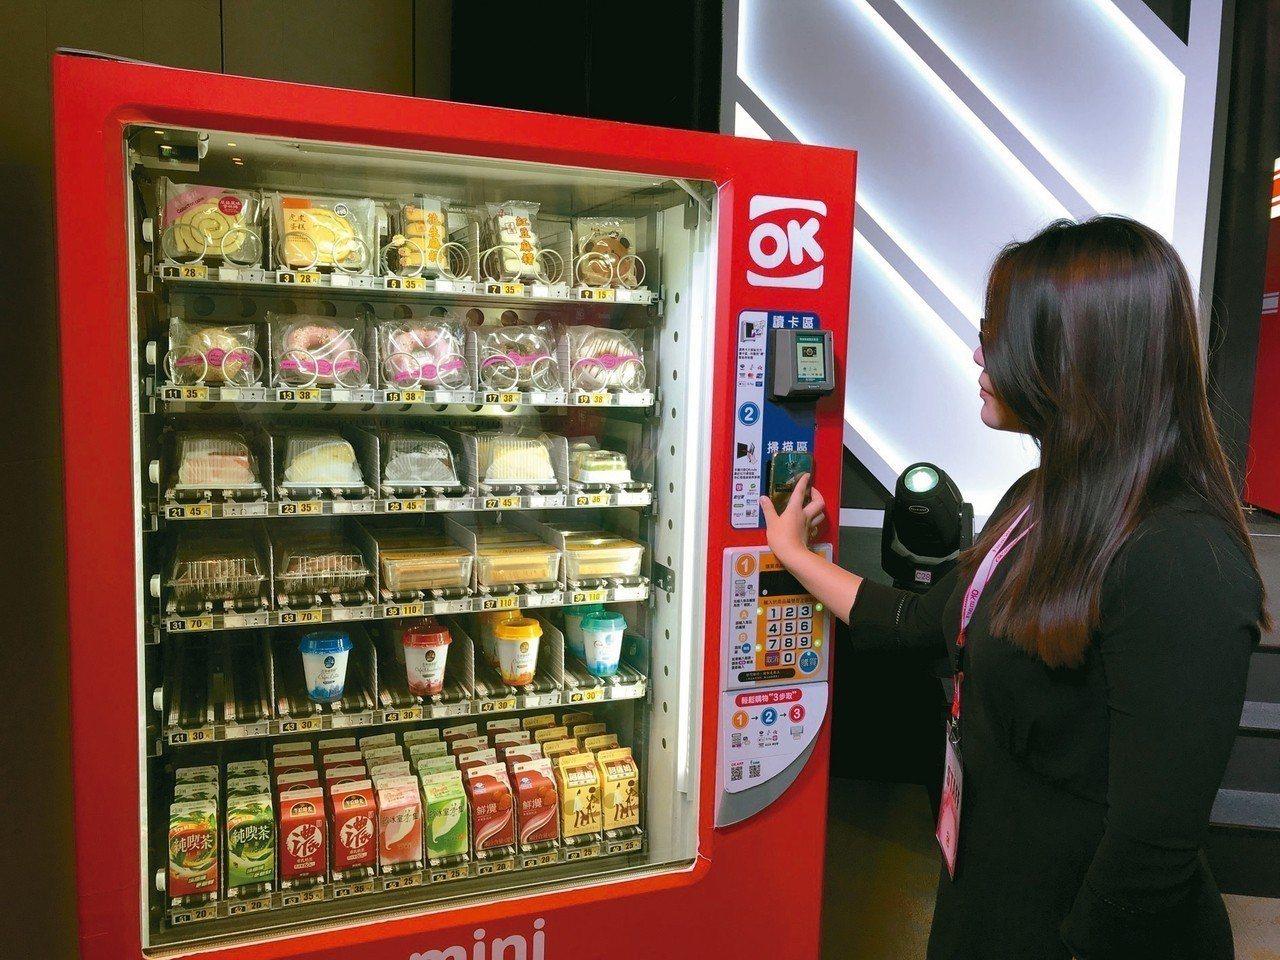 OK超商宣布推出最迷你超商「OK mini」販賣機,可透過超過20種感應支付消費...